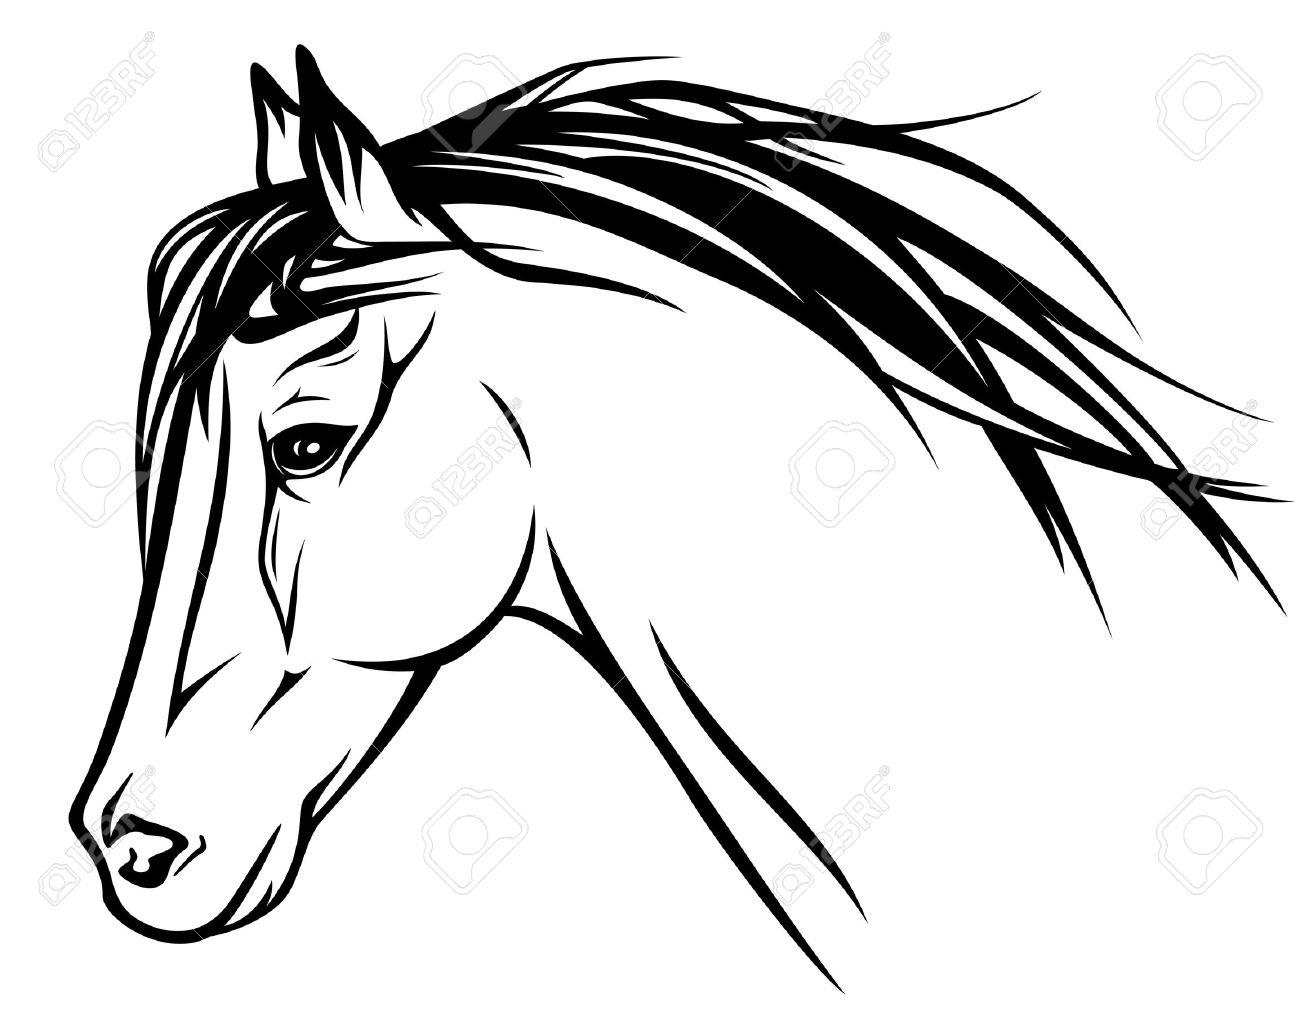 running horse head black and white outline Stock Vector - 16570005